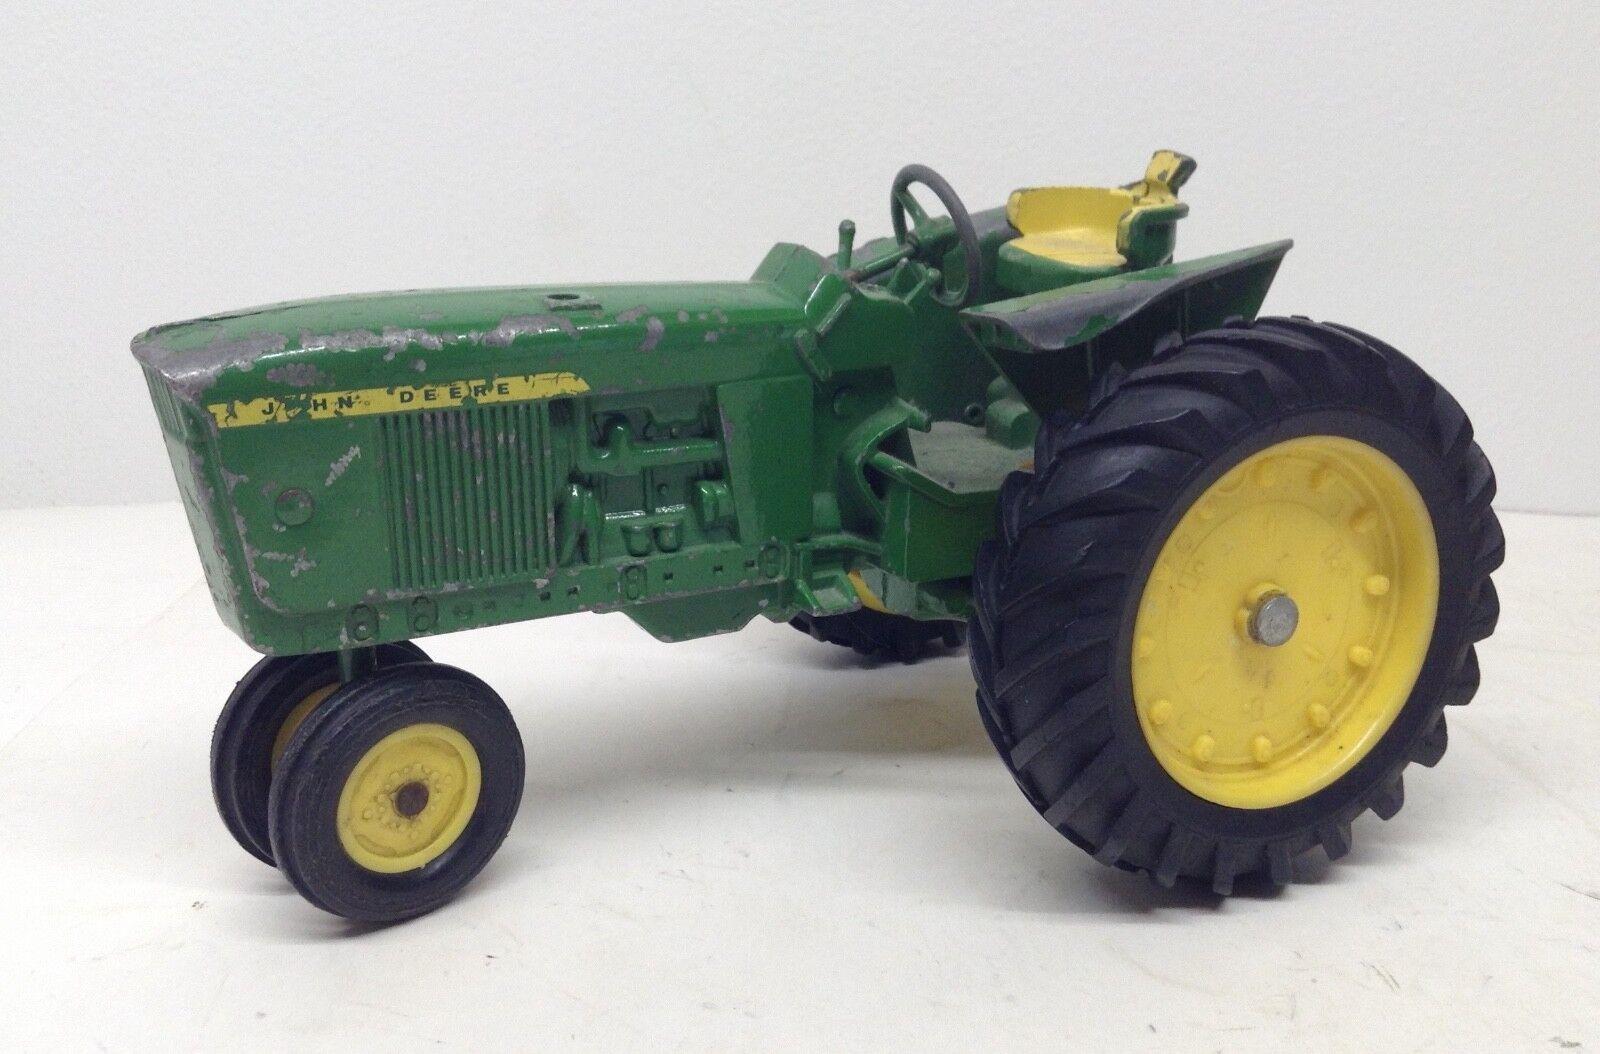 1   16. jahrgang, john deere - traktor traktor traktor w   3020 schmale heck felgen und reifen ertl b52c09